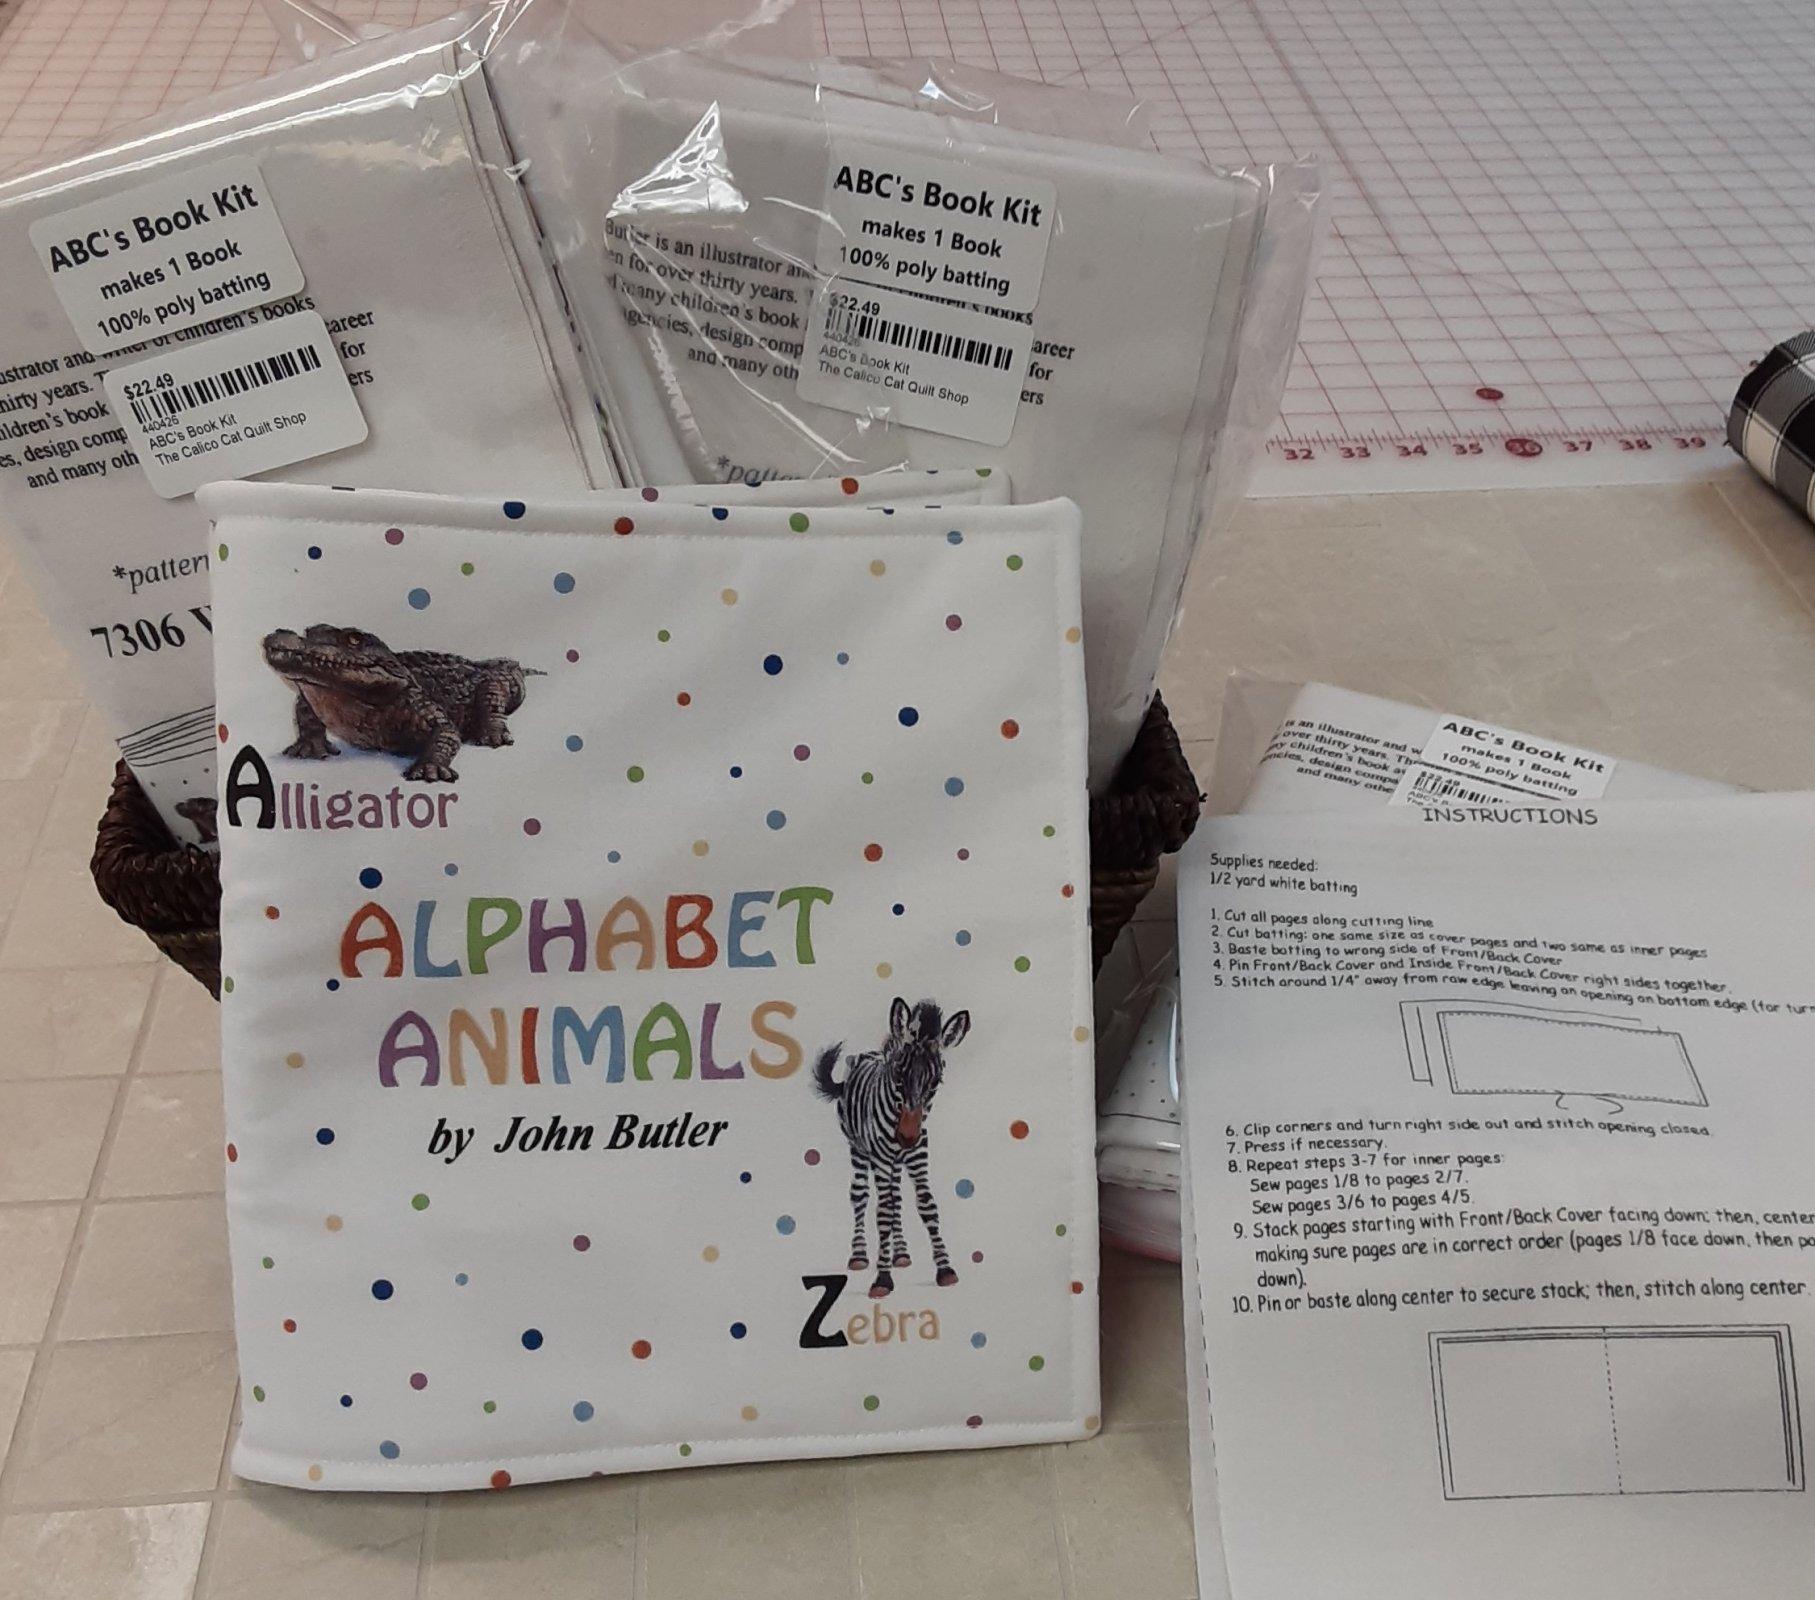 ABC's Book Kit